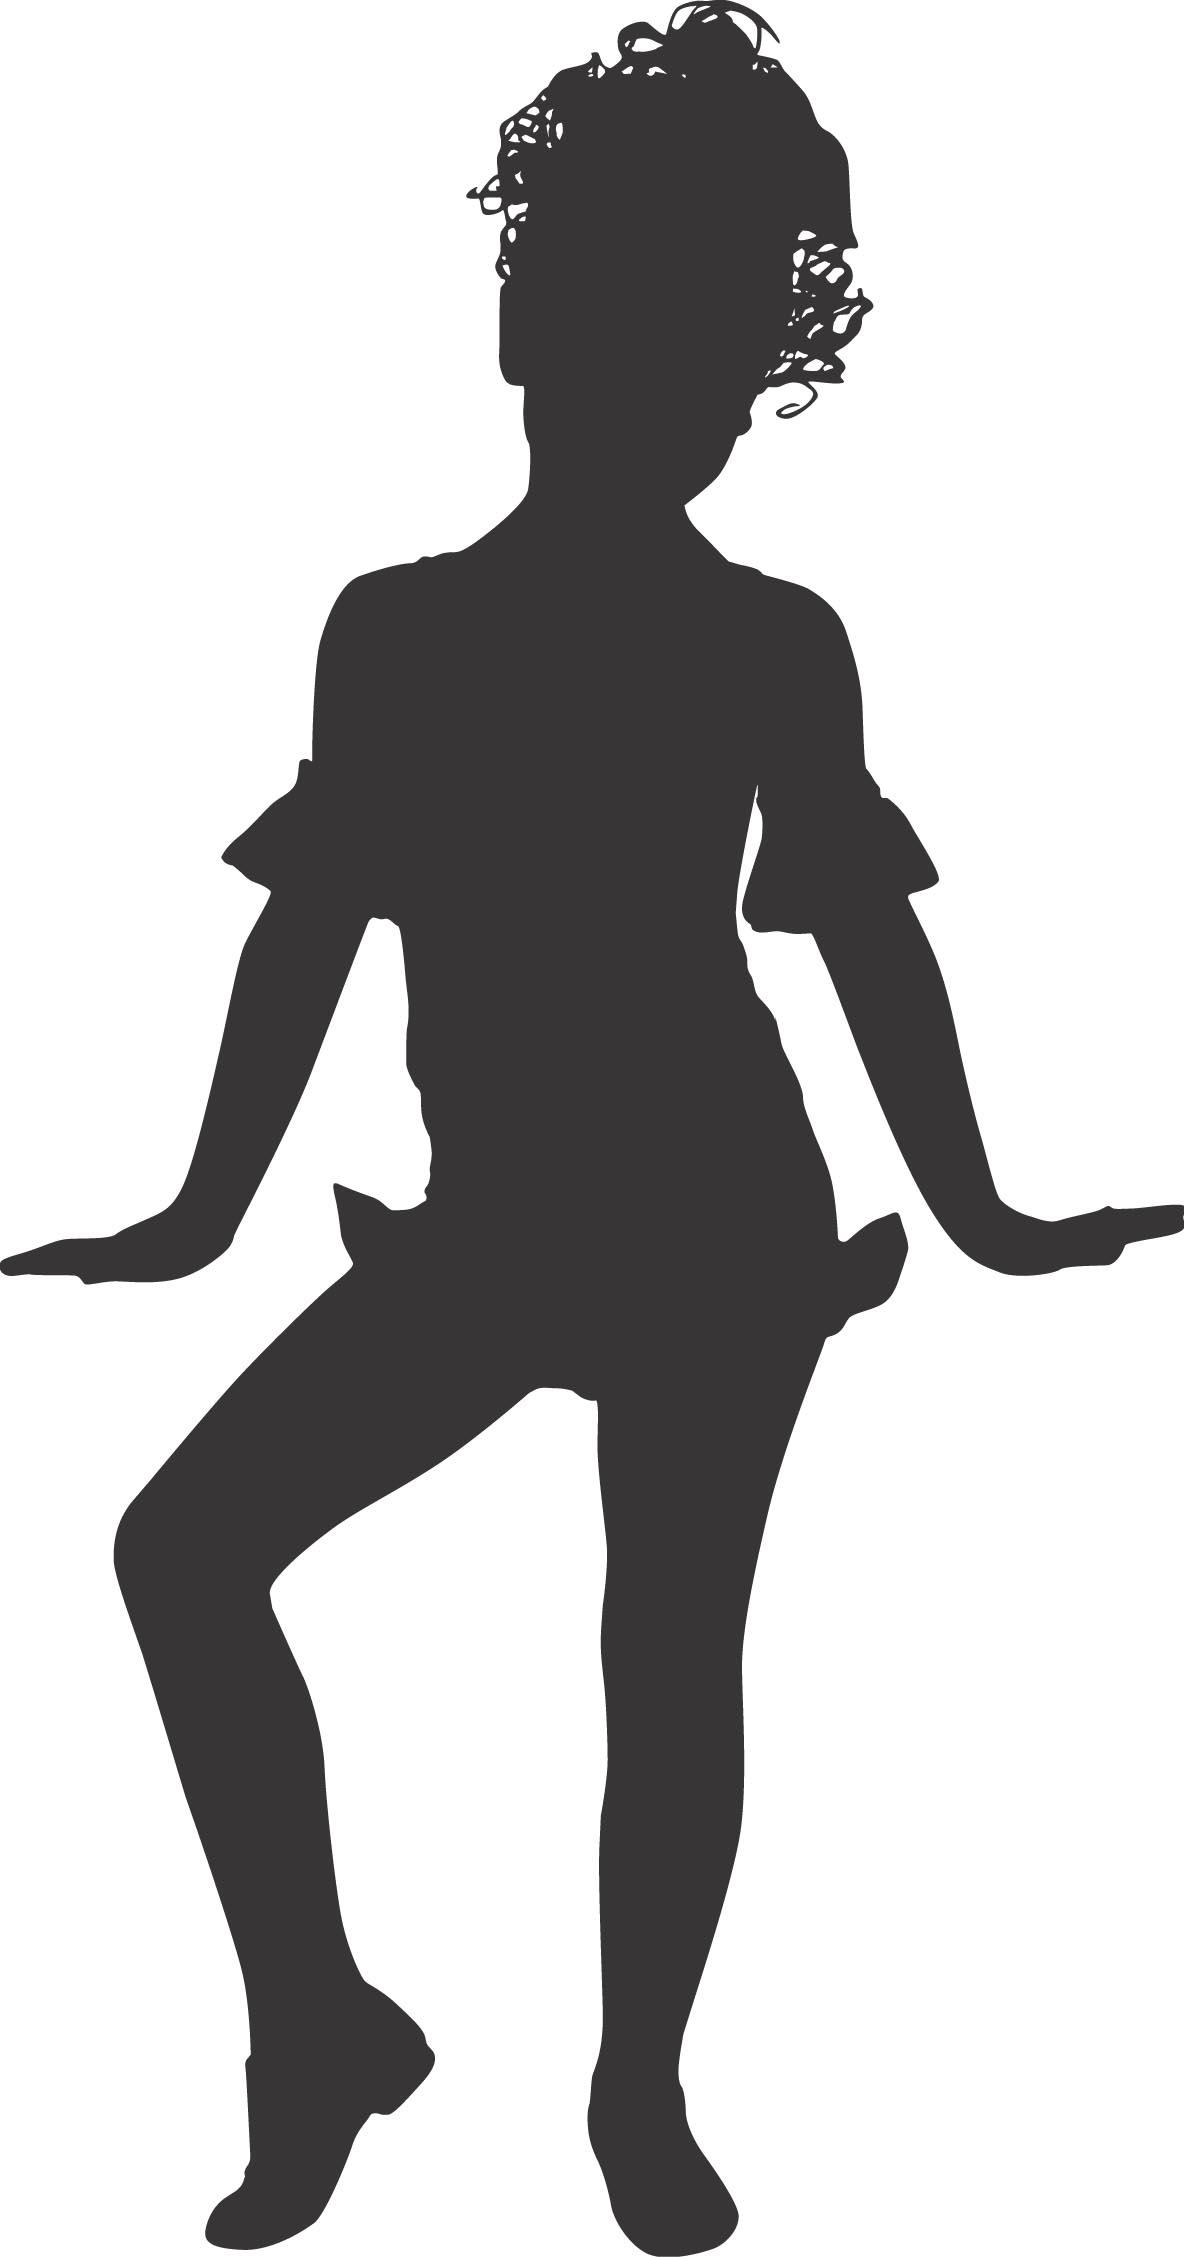 Danse clipart dancing shoe Dance skills clip dance tap